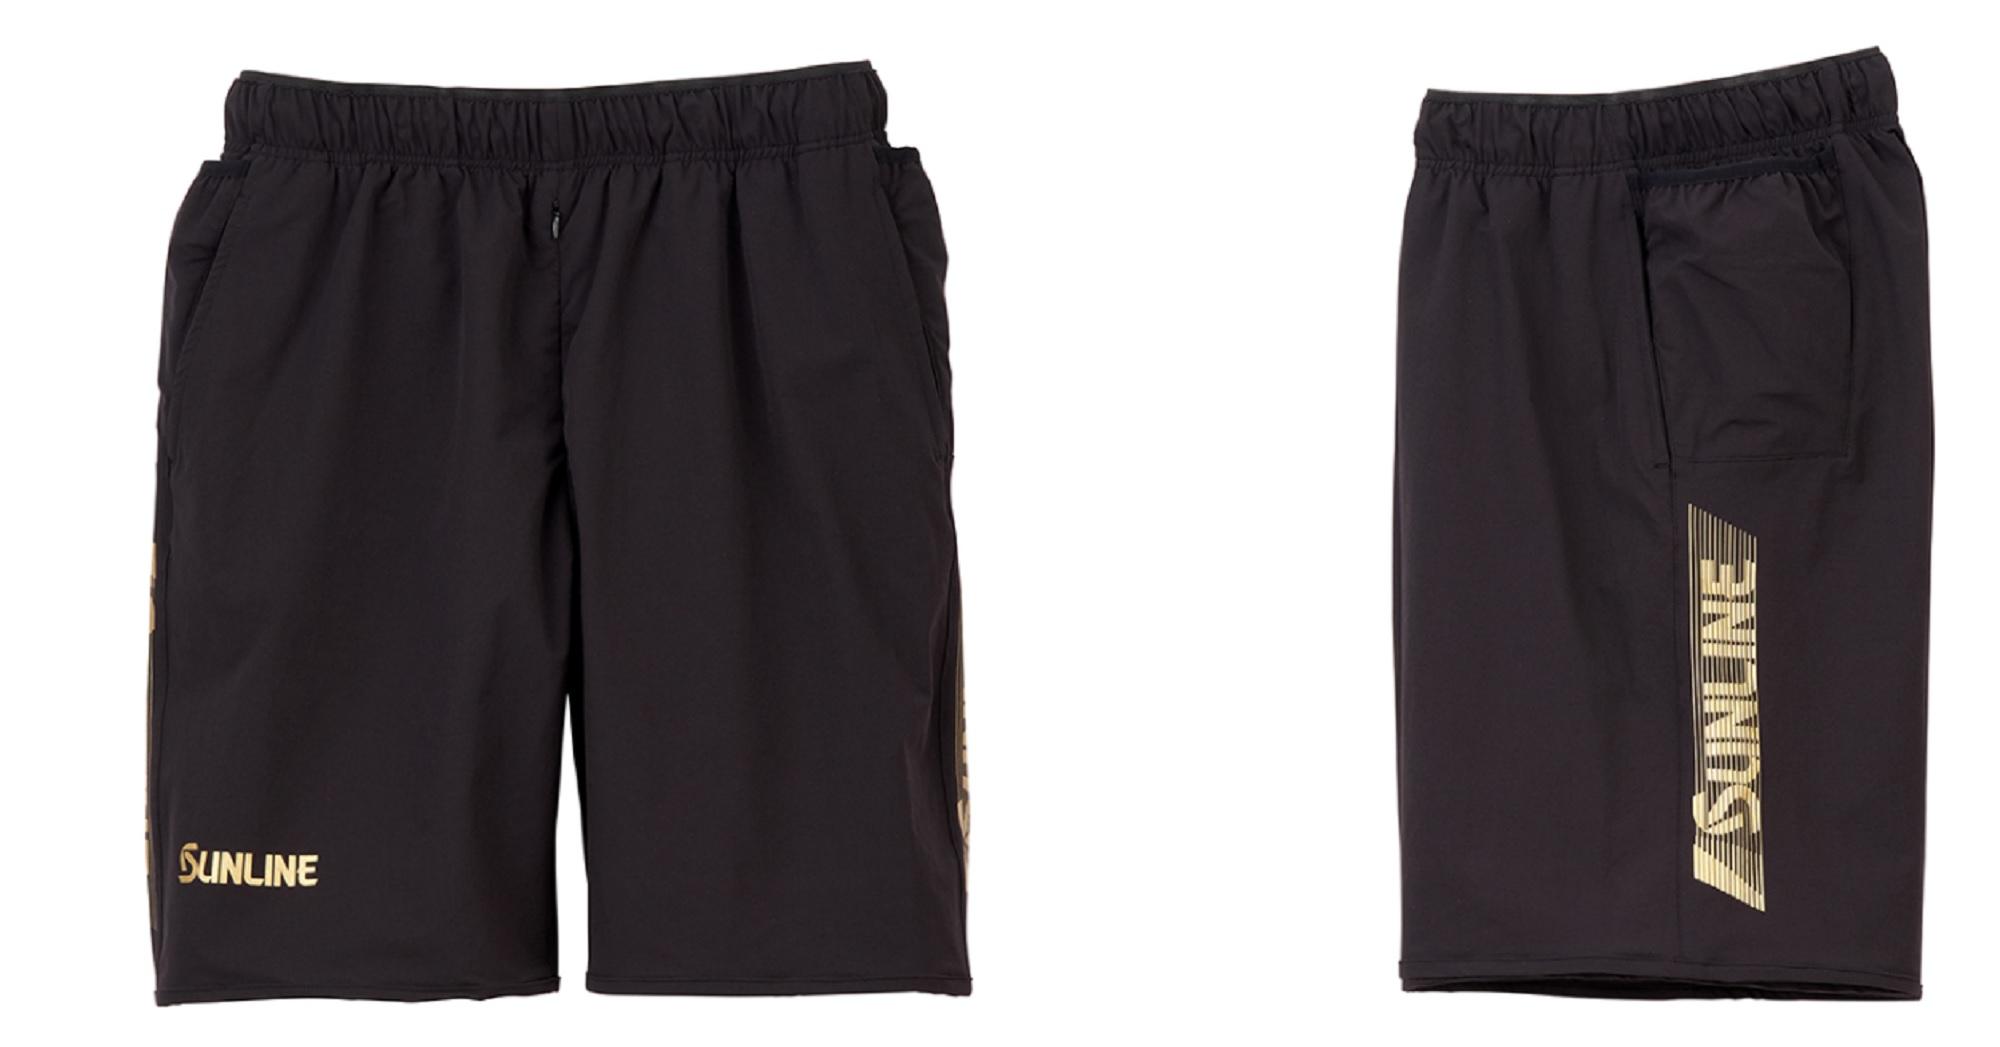 Sunline SUW-1214 Shorts Stretch Black Size LL (2685)